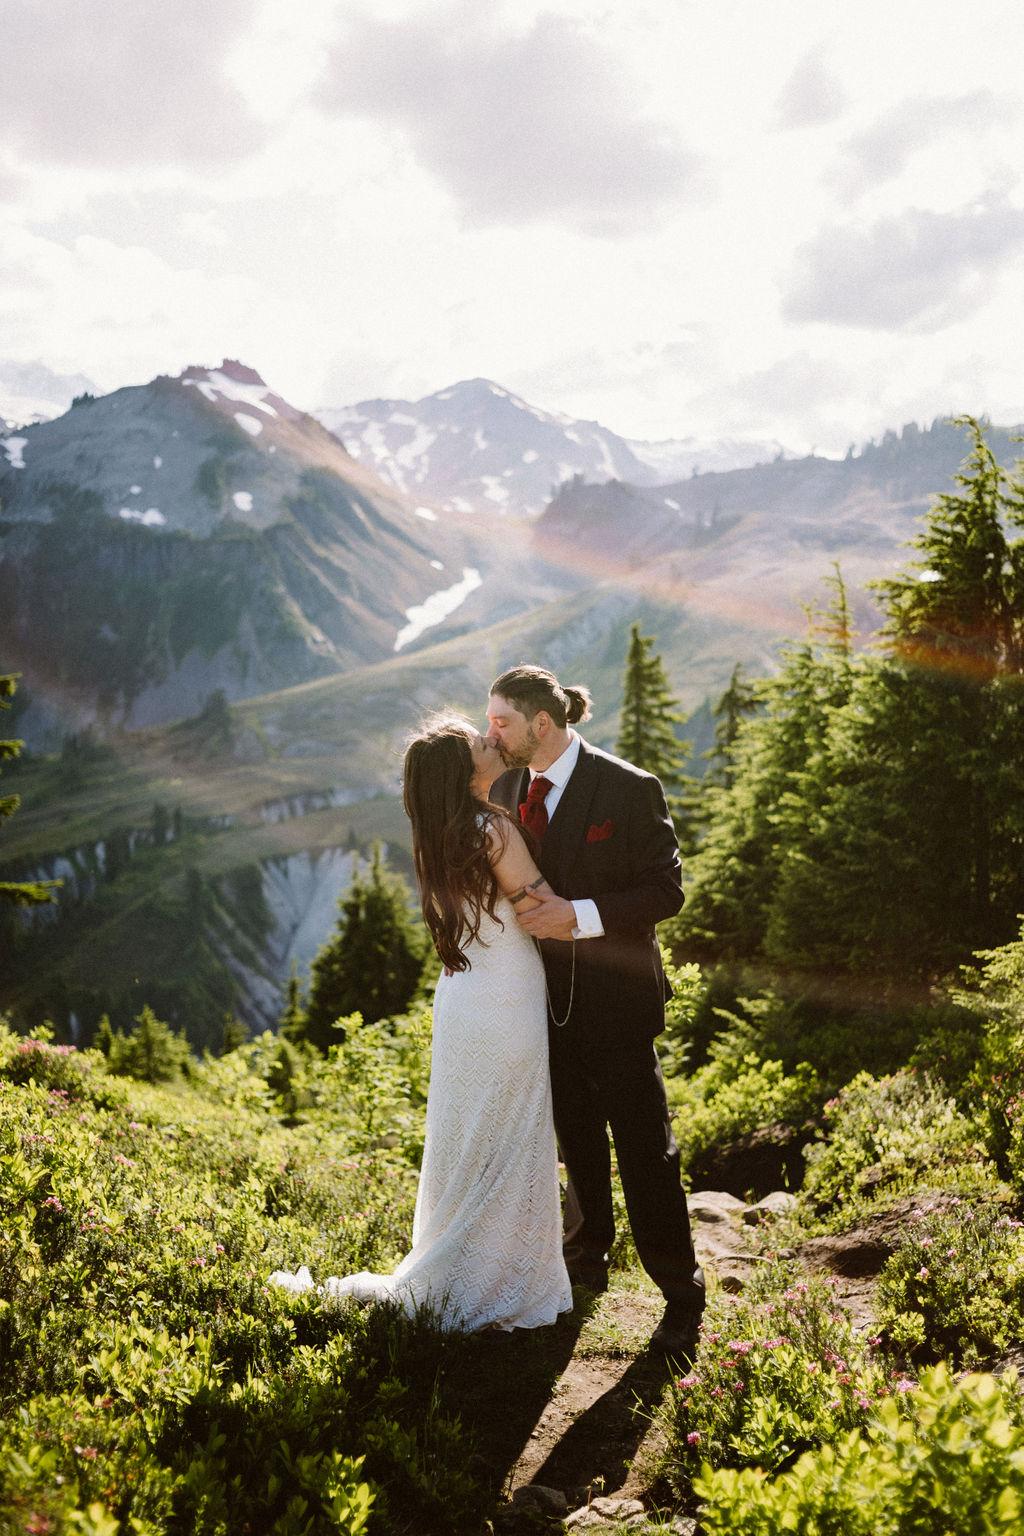 Artist Point Wedding: Katy Shaw and Daniel Callicoat on July 29, 2019